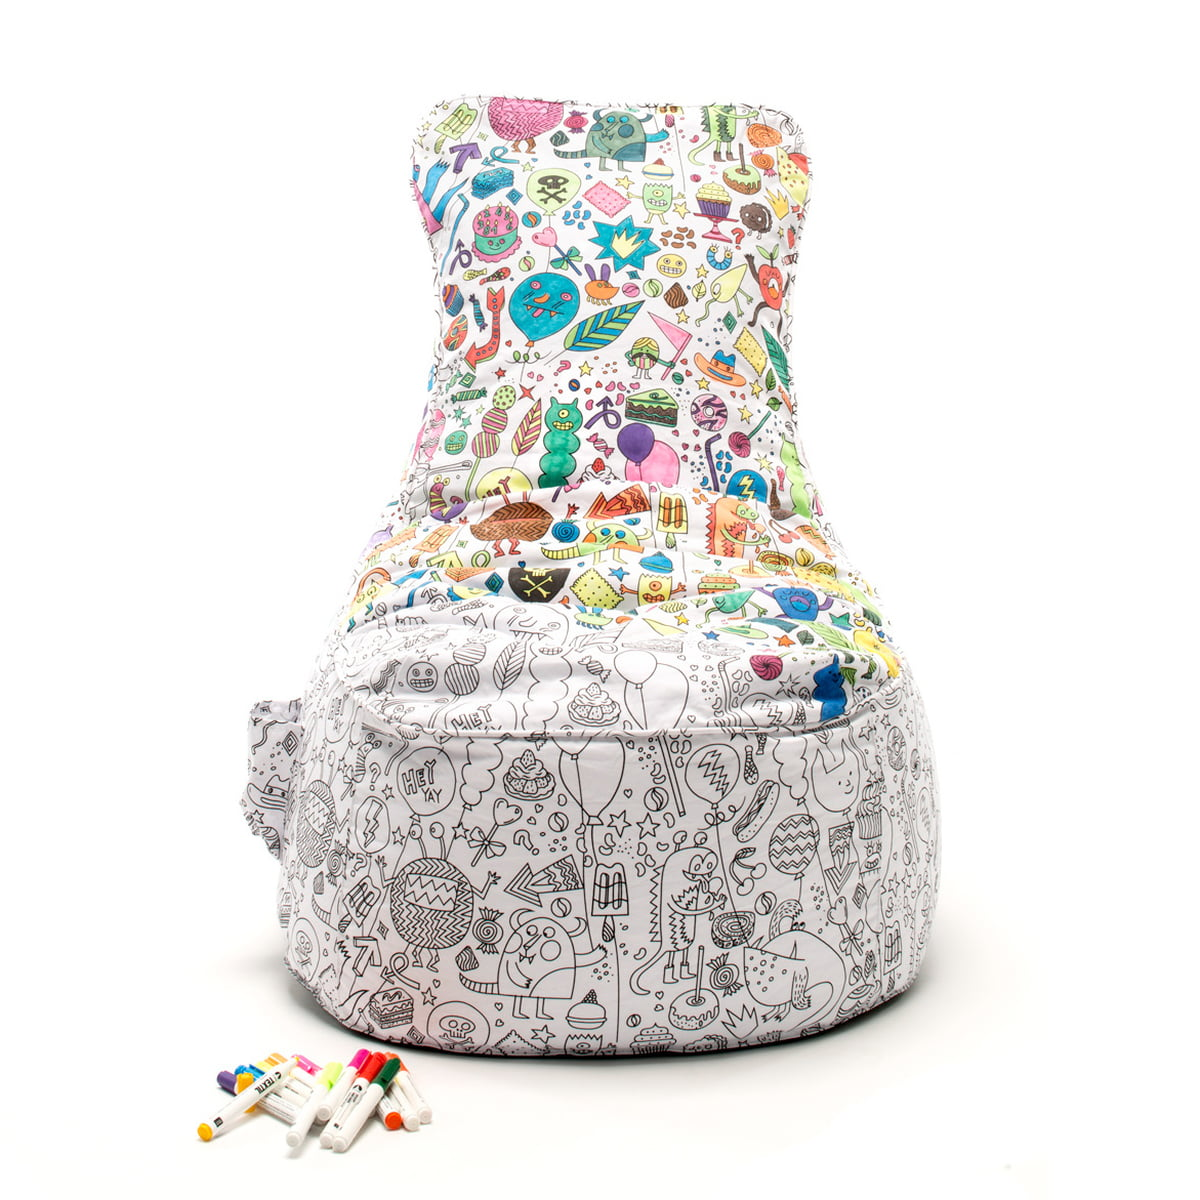 paint me sitzsack von sitting bull kaufen. Black Bedroom Furniture Sets. Home Design Ideas